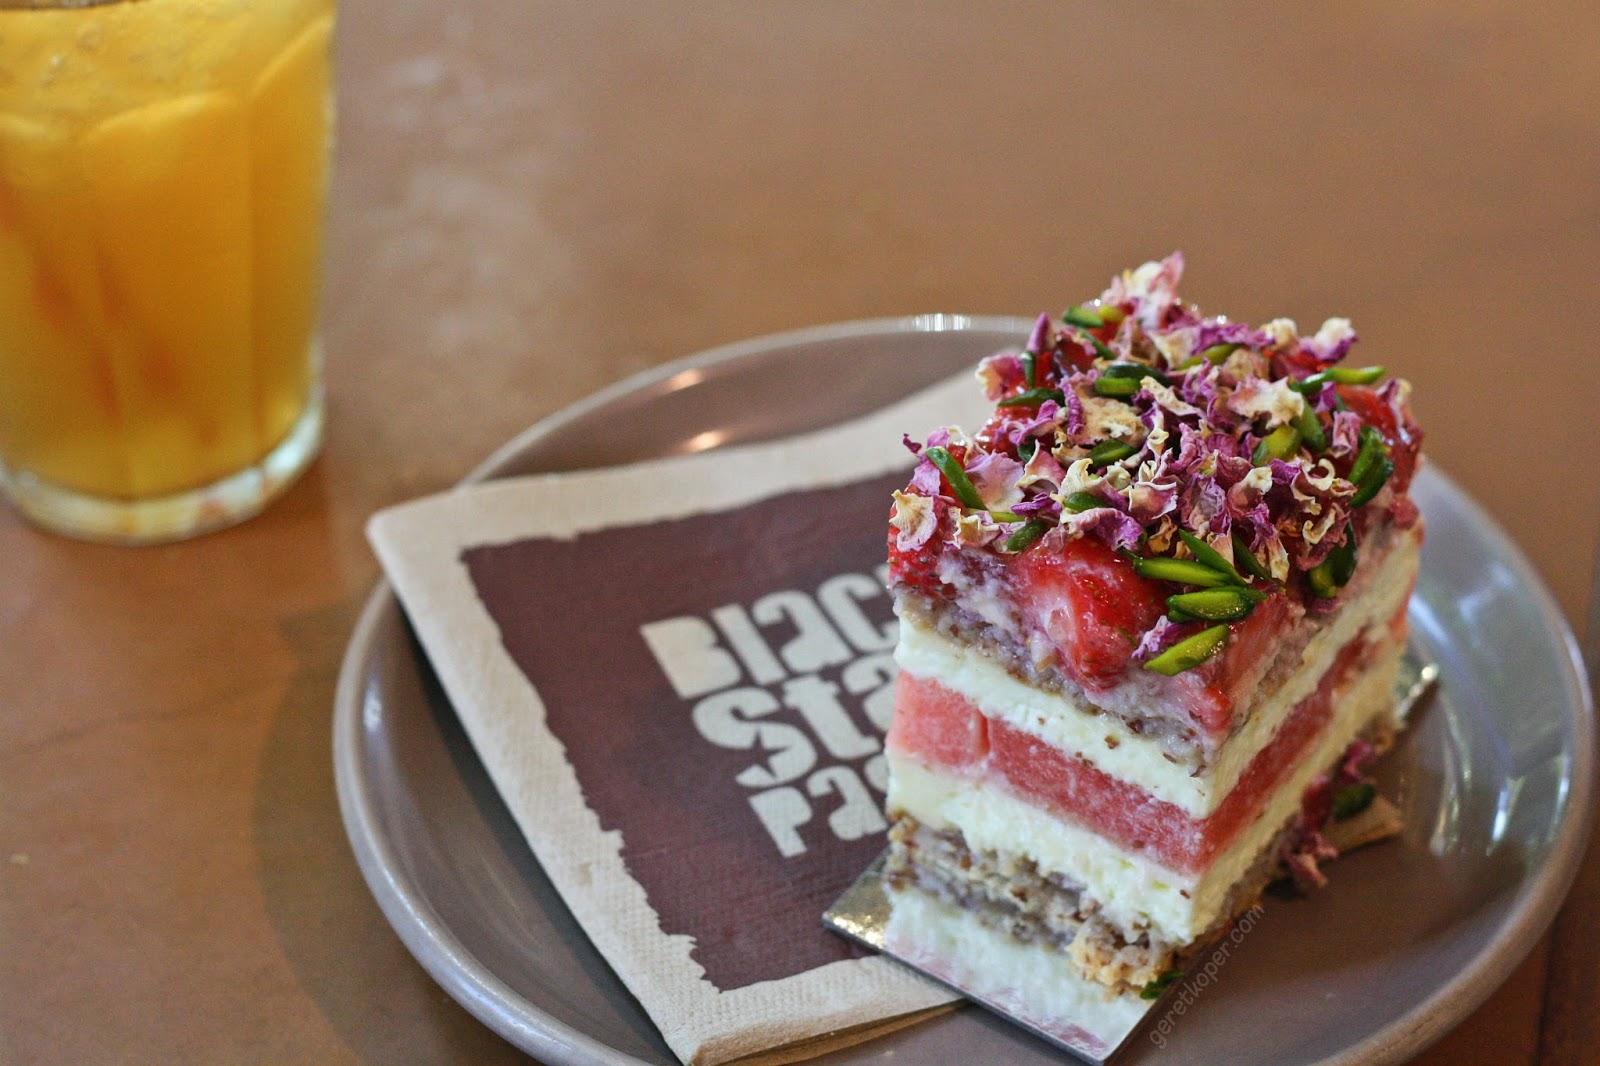 Halal Cake Shop Sydney